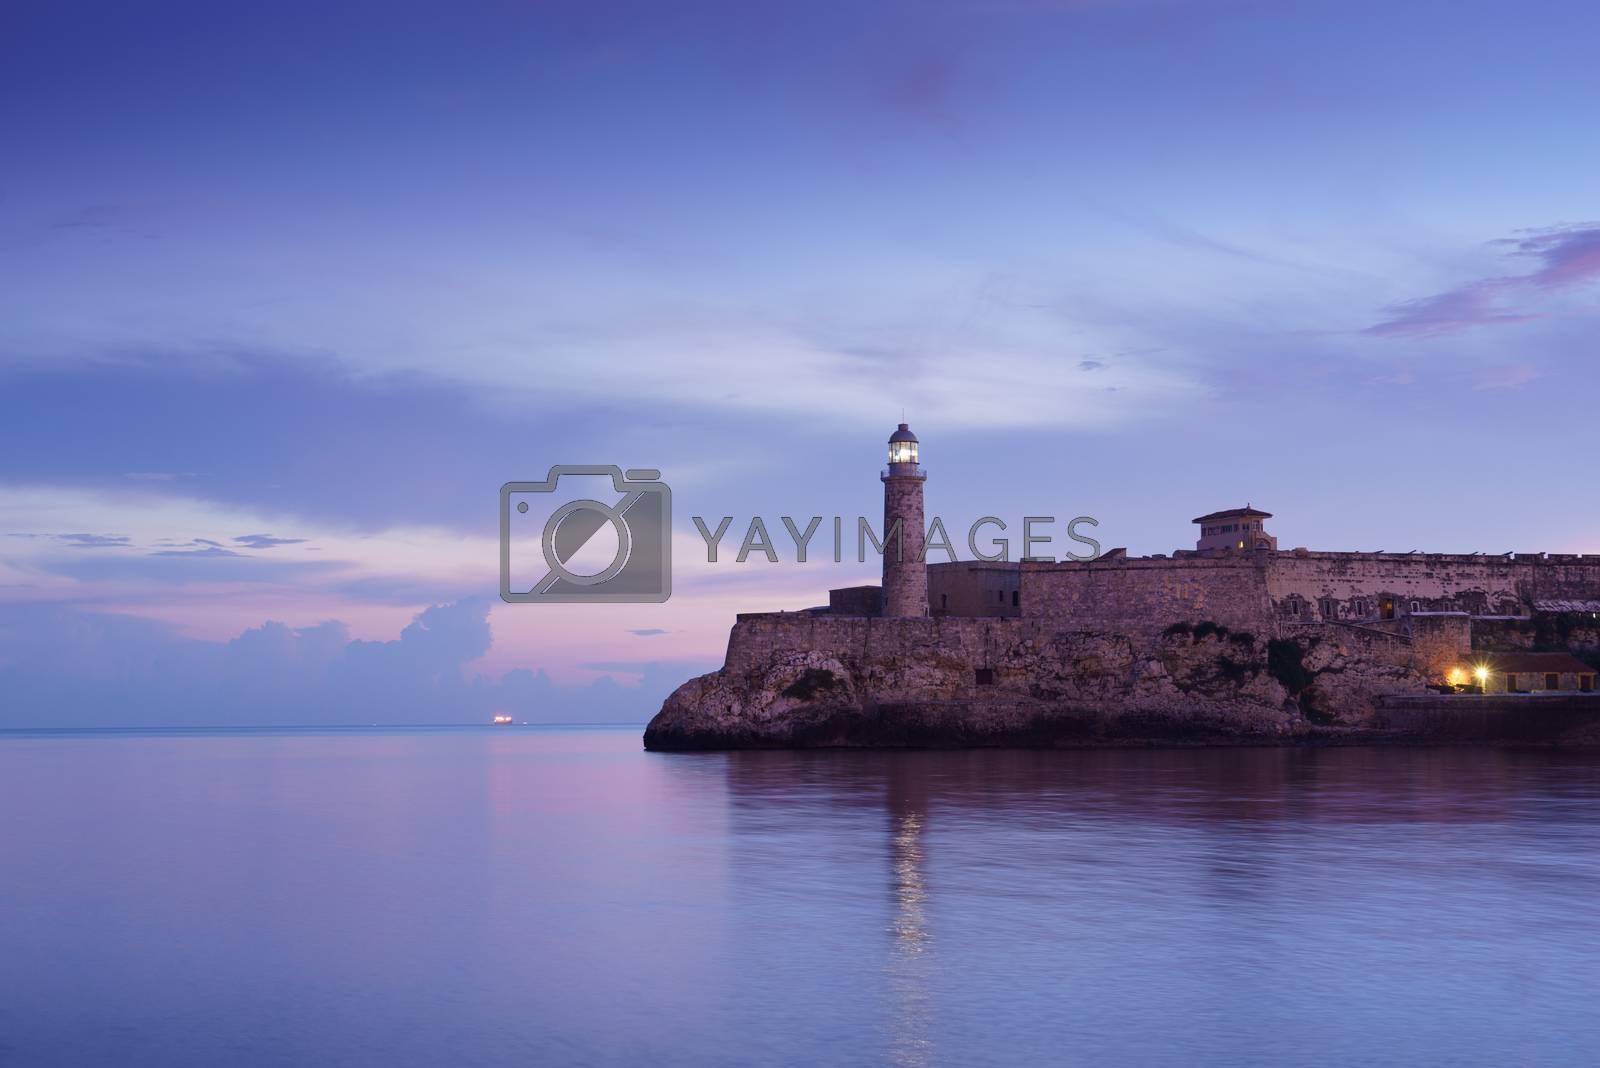 Royalty free image of Cuba, Caribbean Sea, la habana, havana, morro, lighthouse by diego_cervo